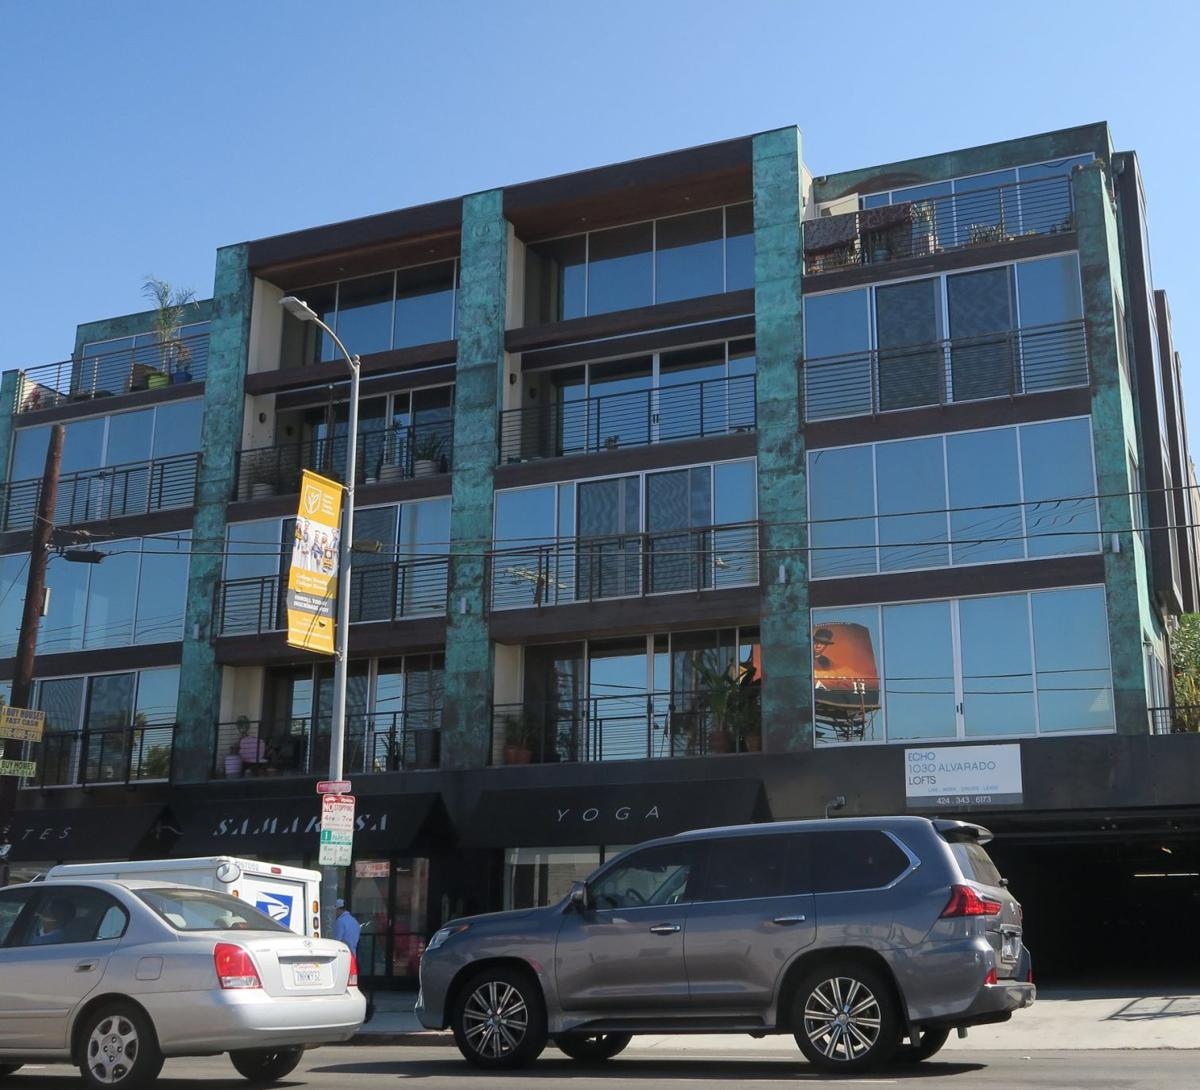 1030 Alvarado Street - Echo 1030 Live/Work Lofts